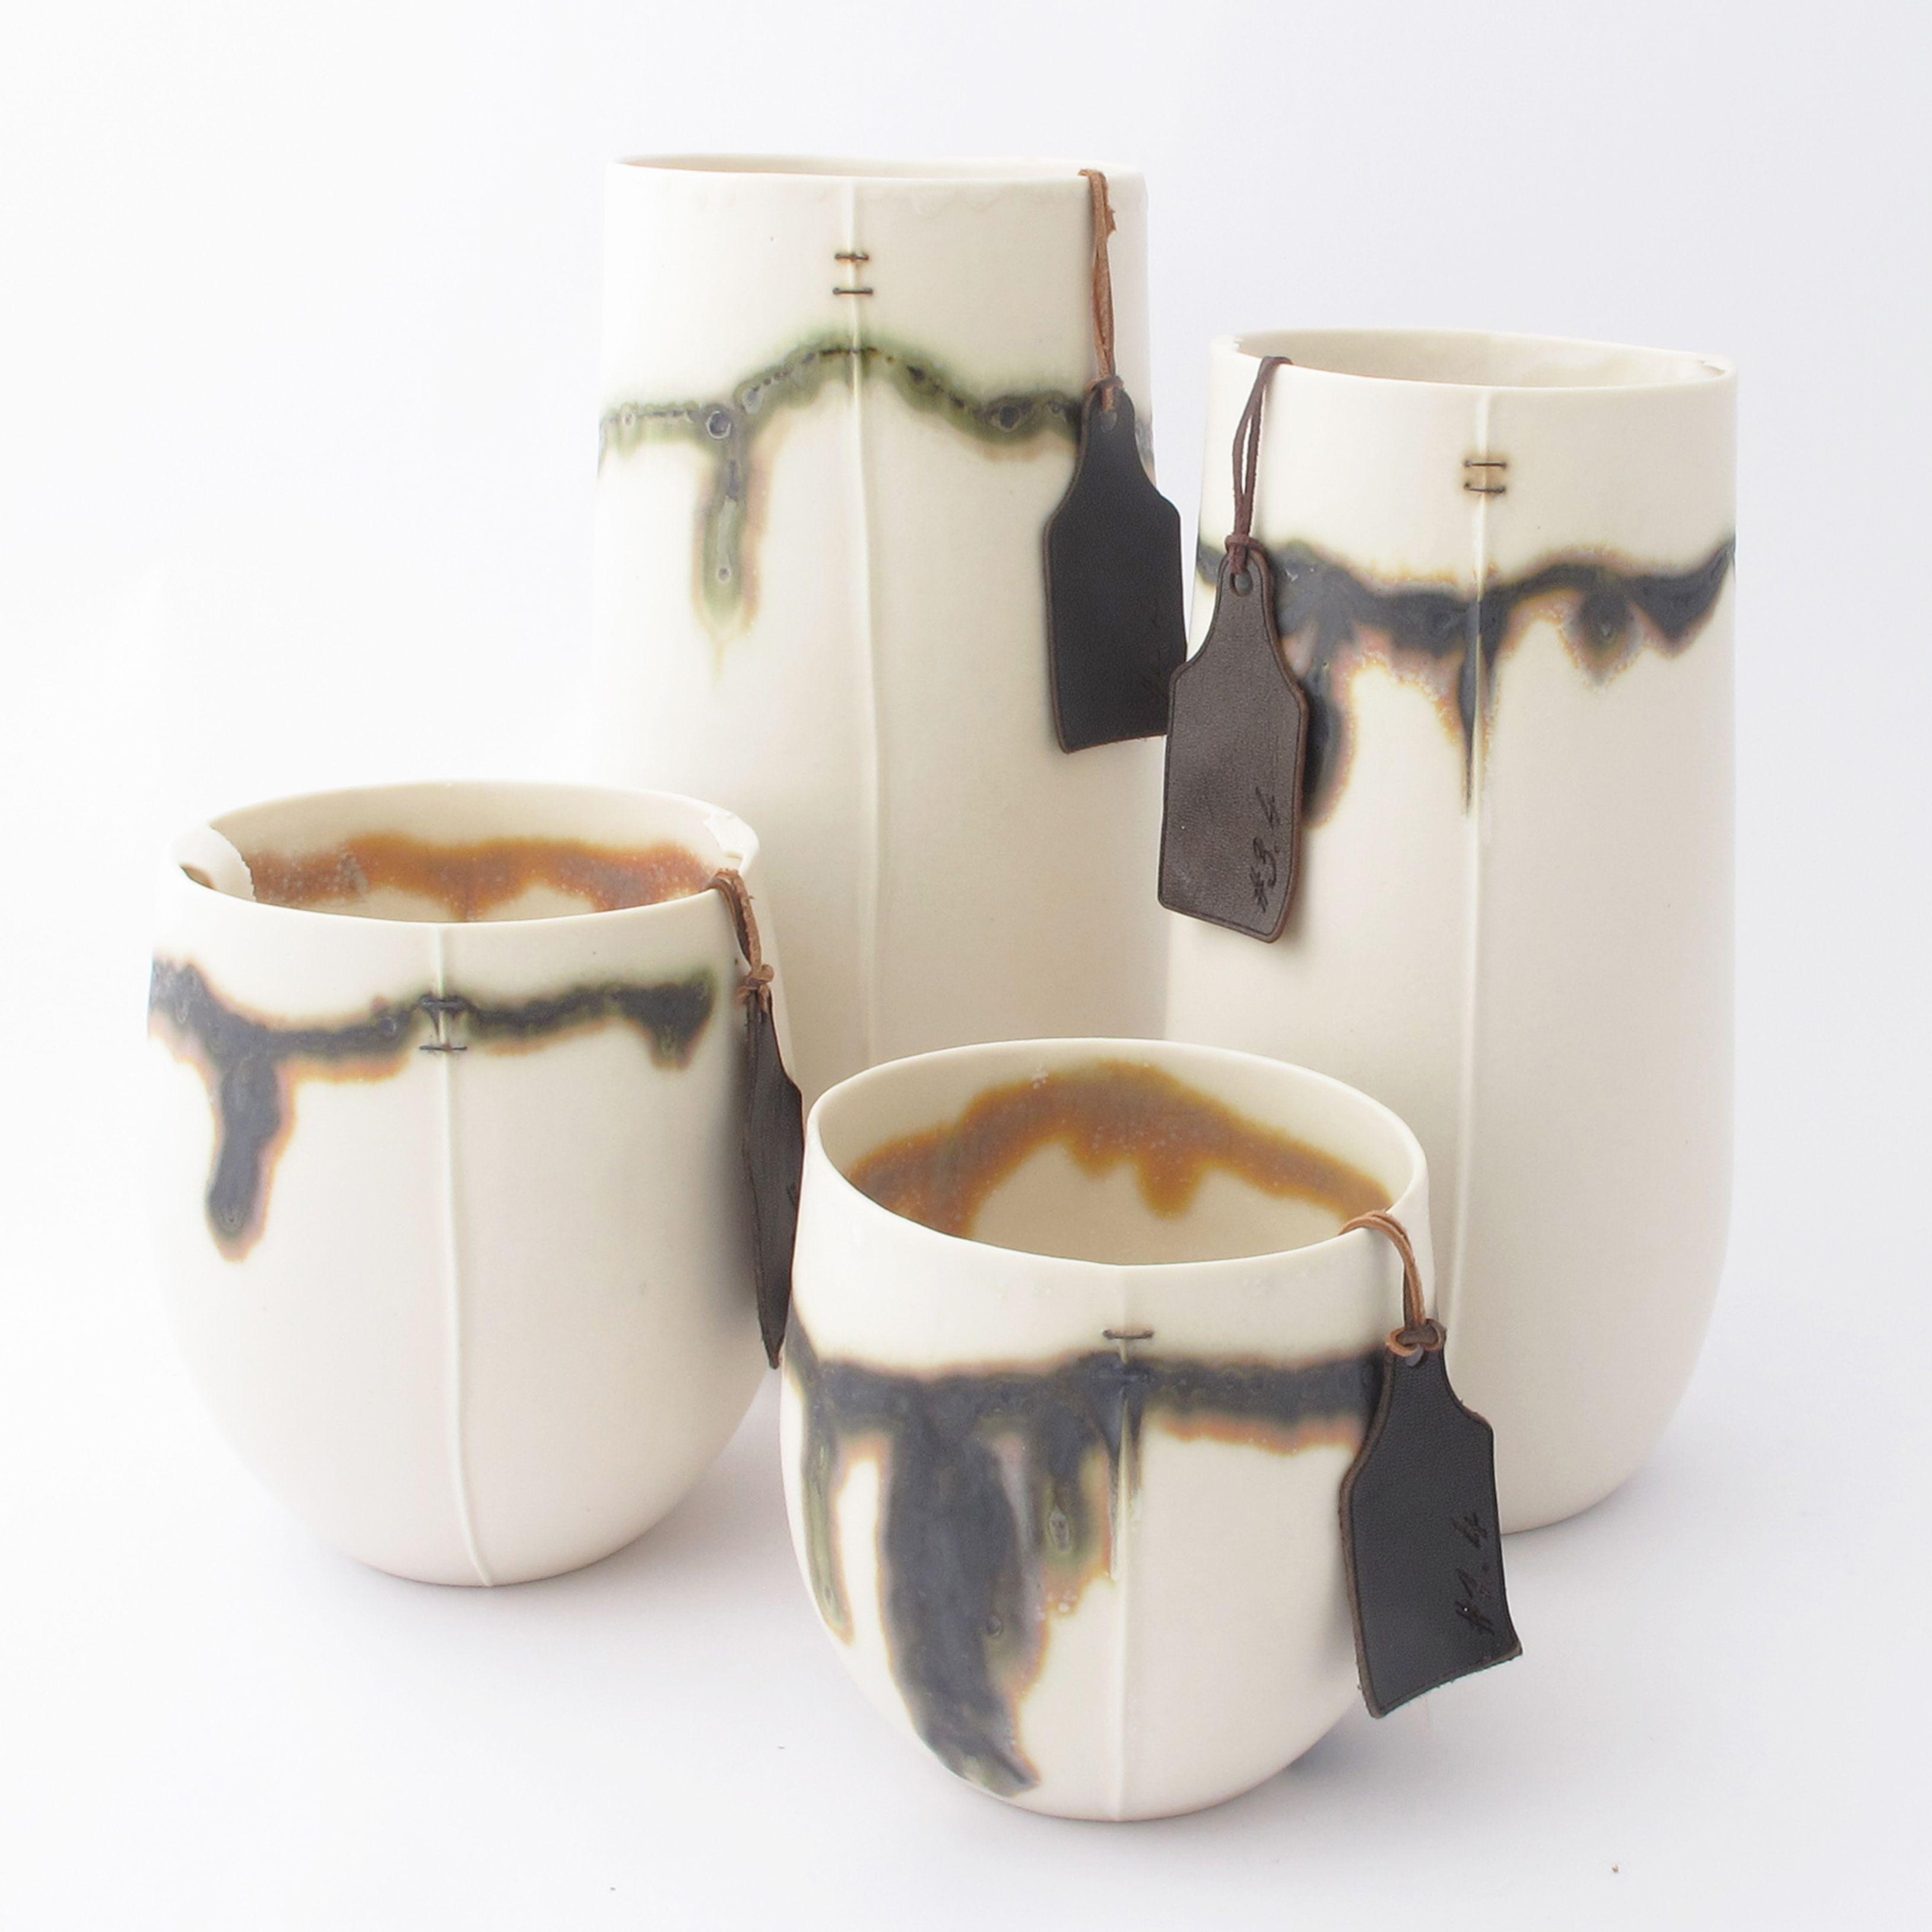 Taxidermy Range, Brittany Delany Ceramics www.brittanydelany.co.uk